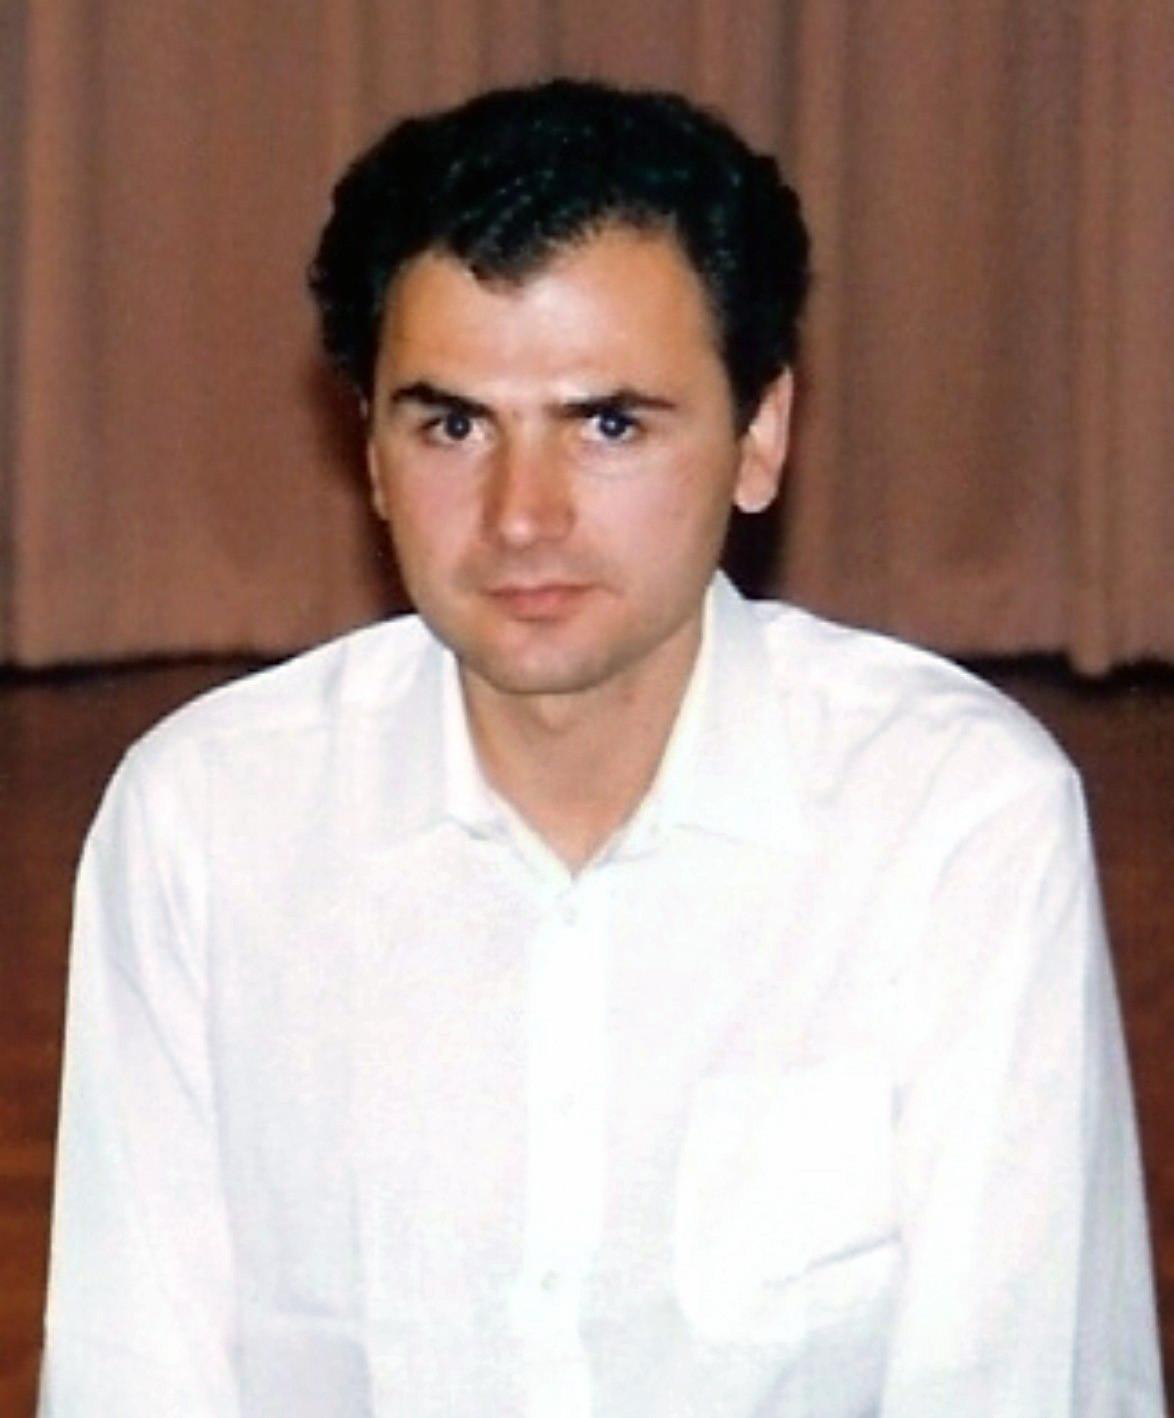 Images of Dejan Stojanovic | 1174x1418